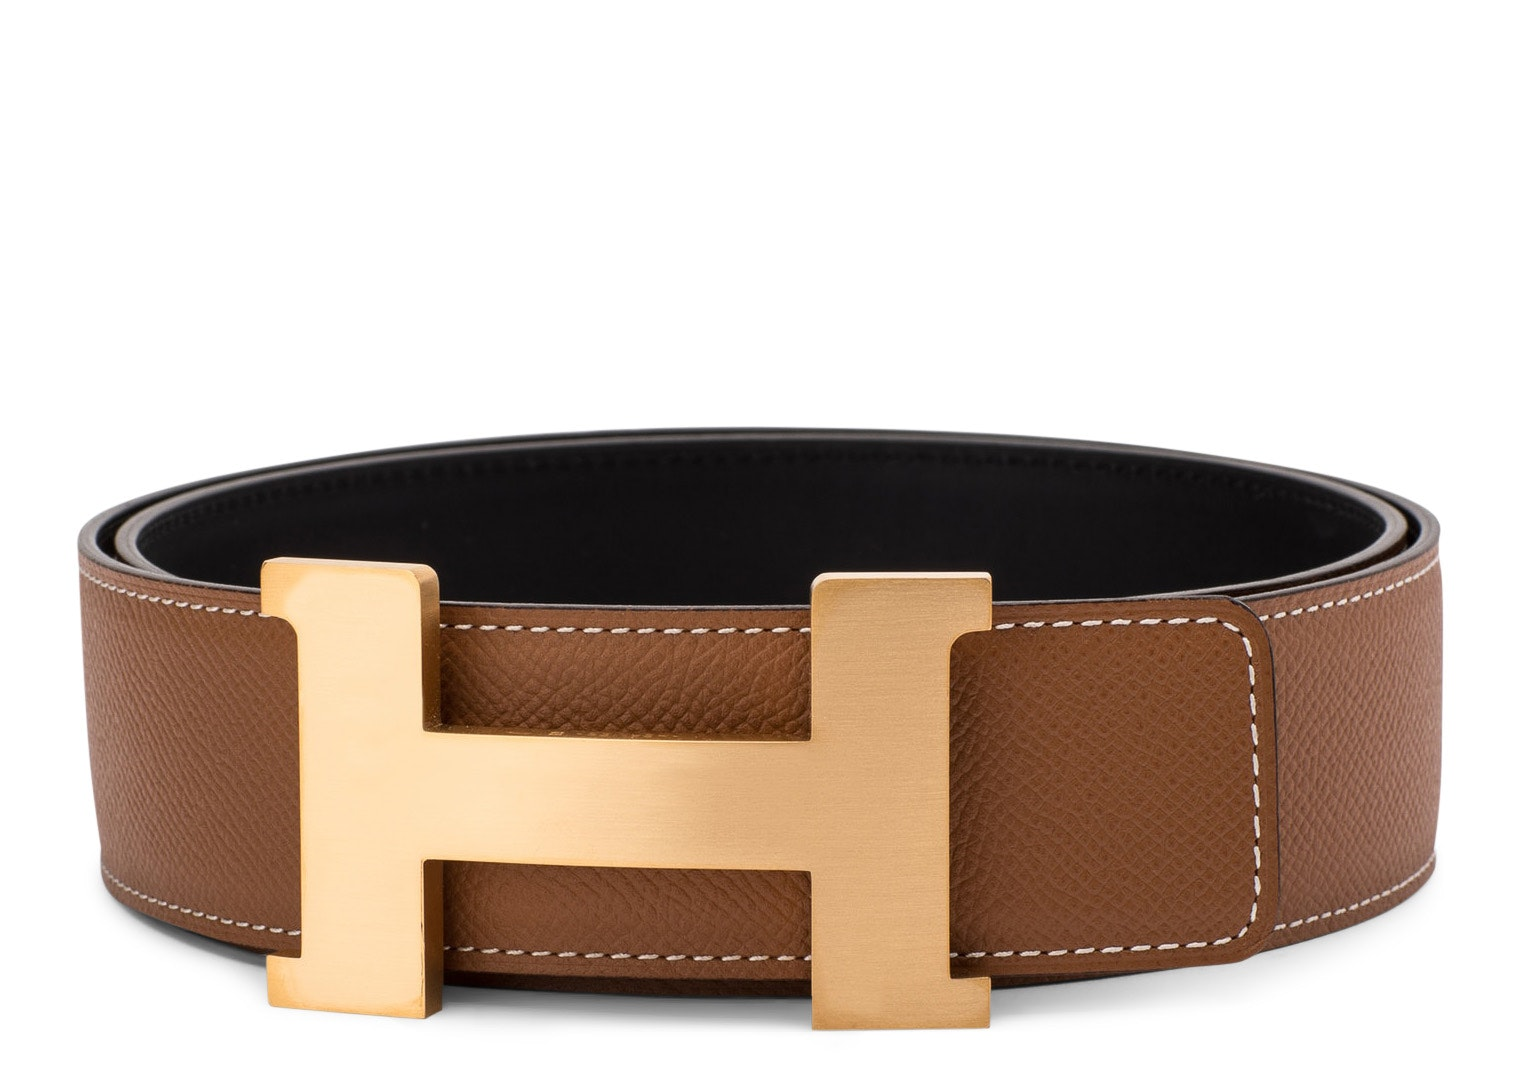 Hermes Constance Belt Buckle & Reversible Leather Strap 1.75 Width Natural